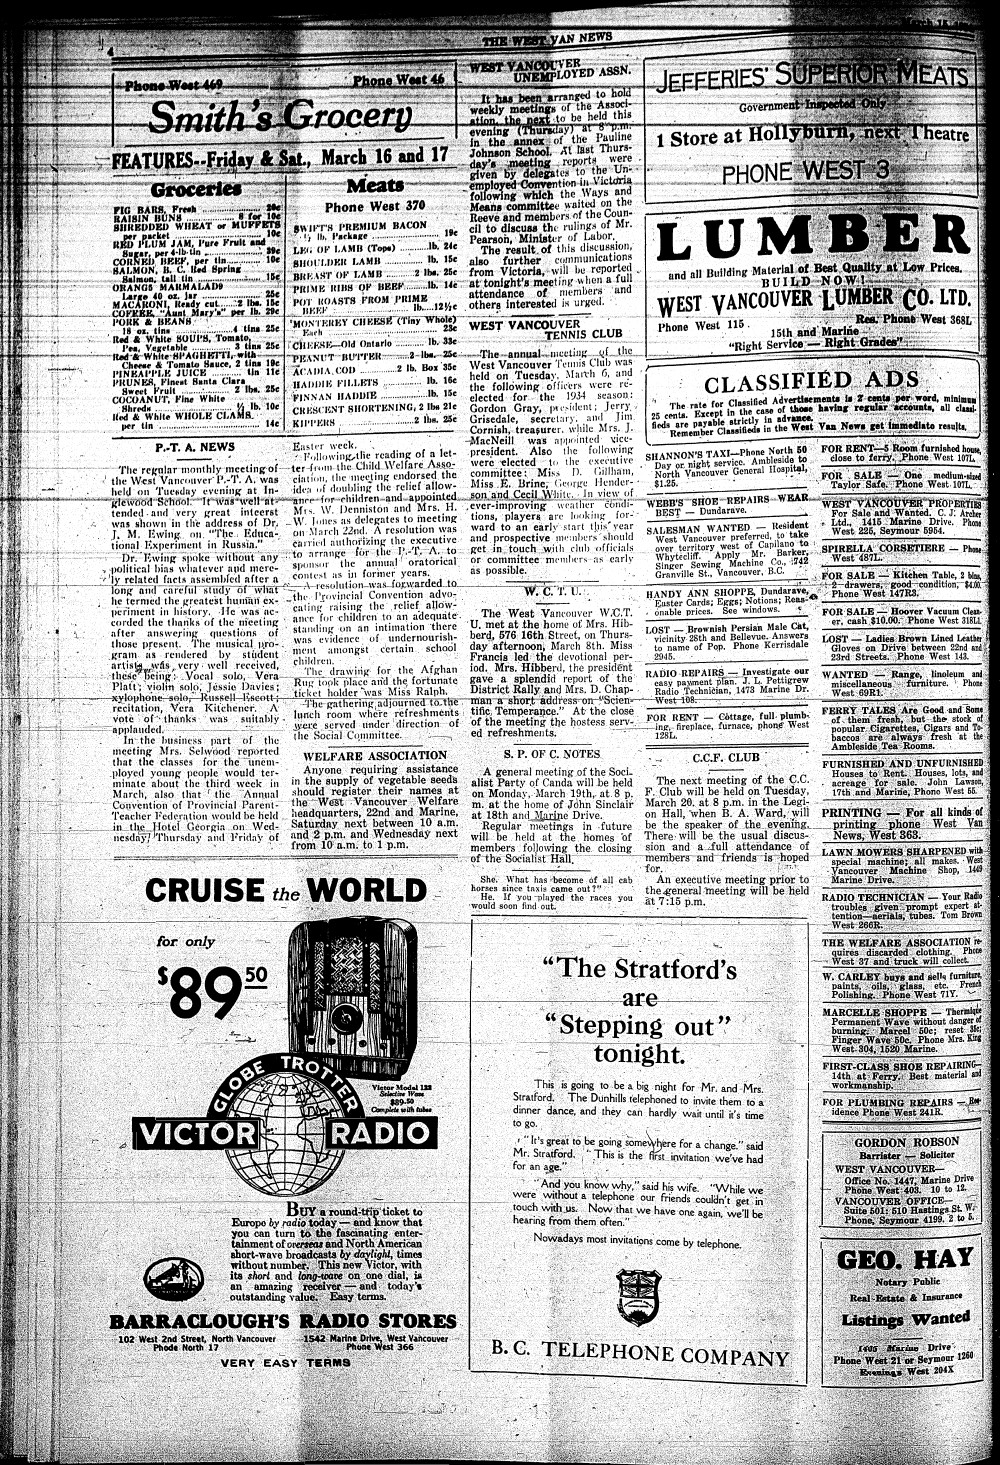 West Van. News (West Vancouver), 15 Mar 1934